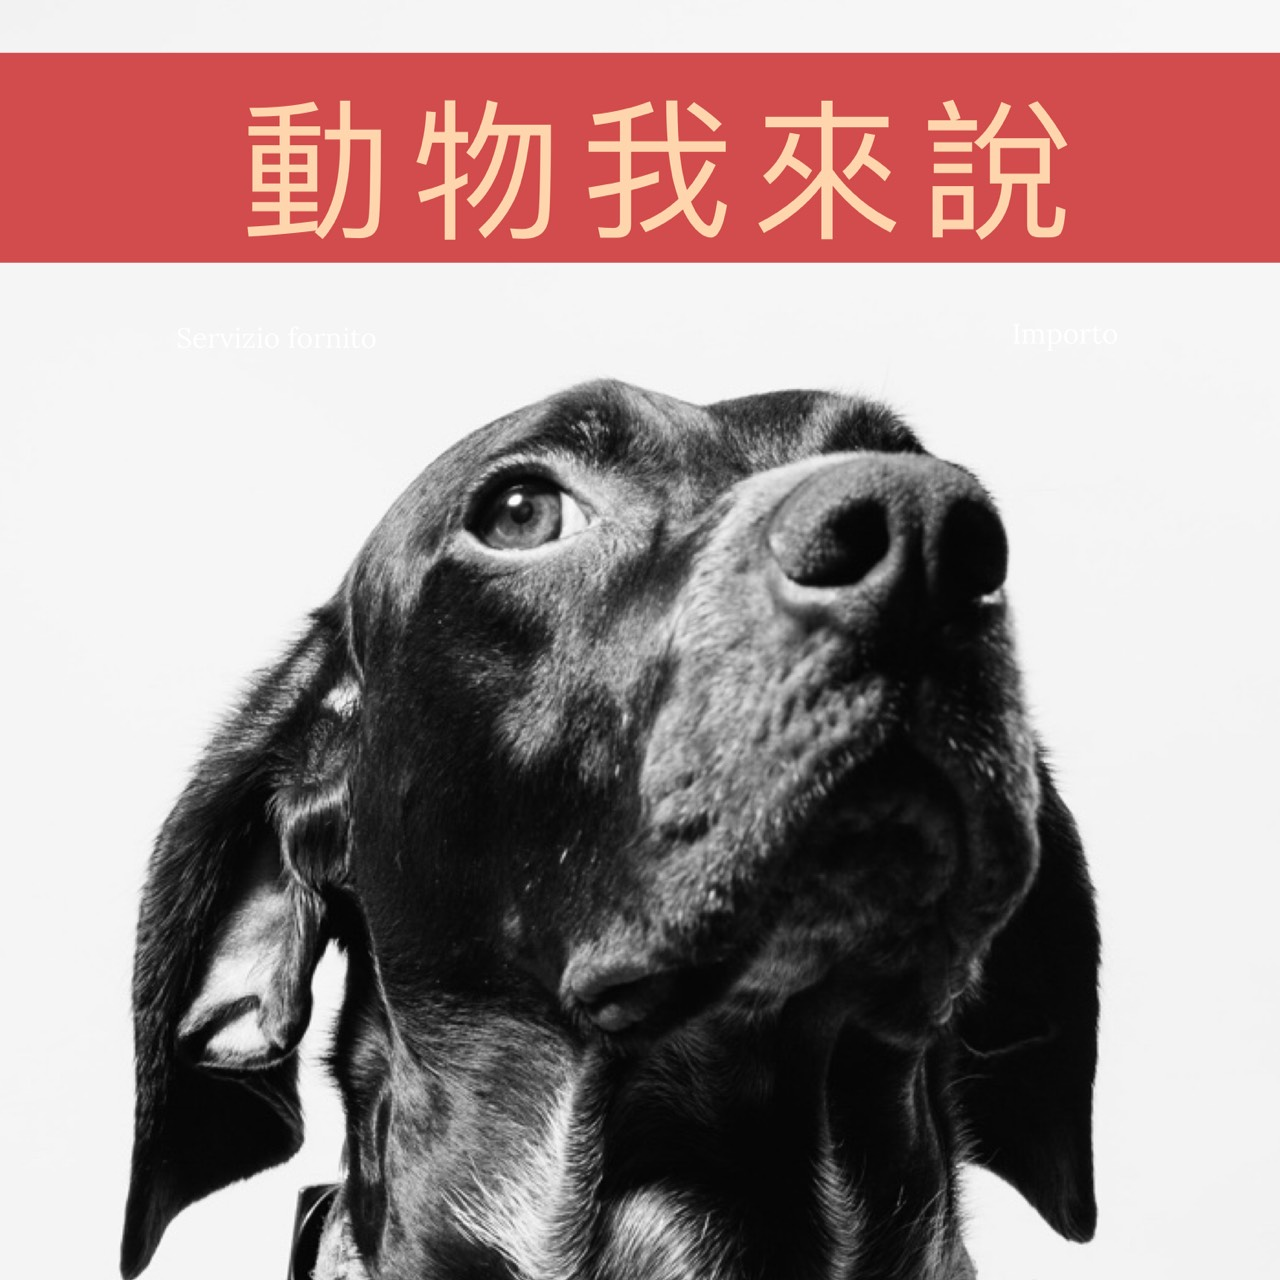 Ep12—動物我來說系列《狗狗不打預防針,傷心又傷身》